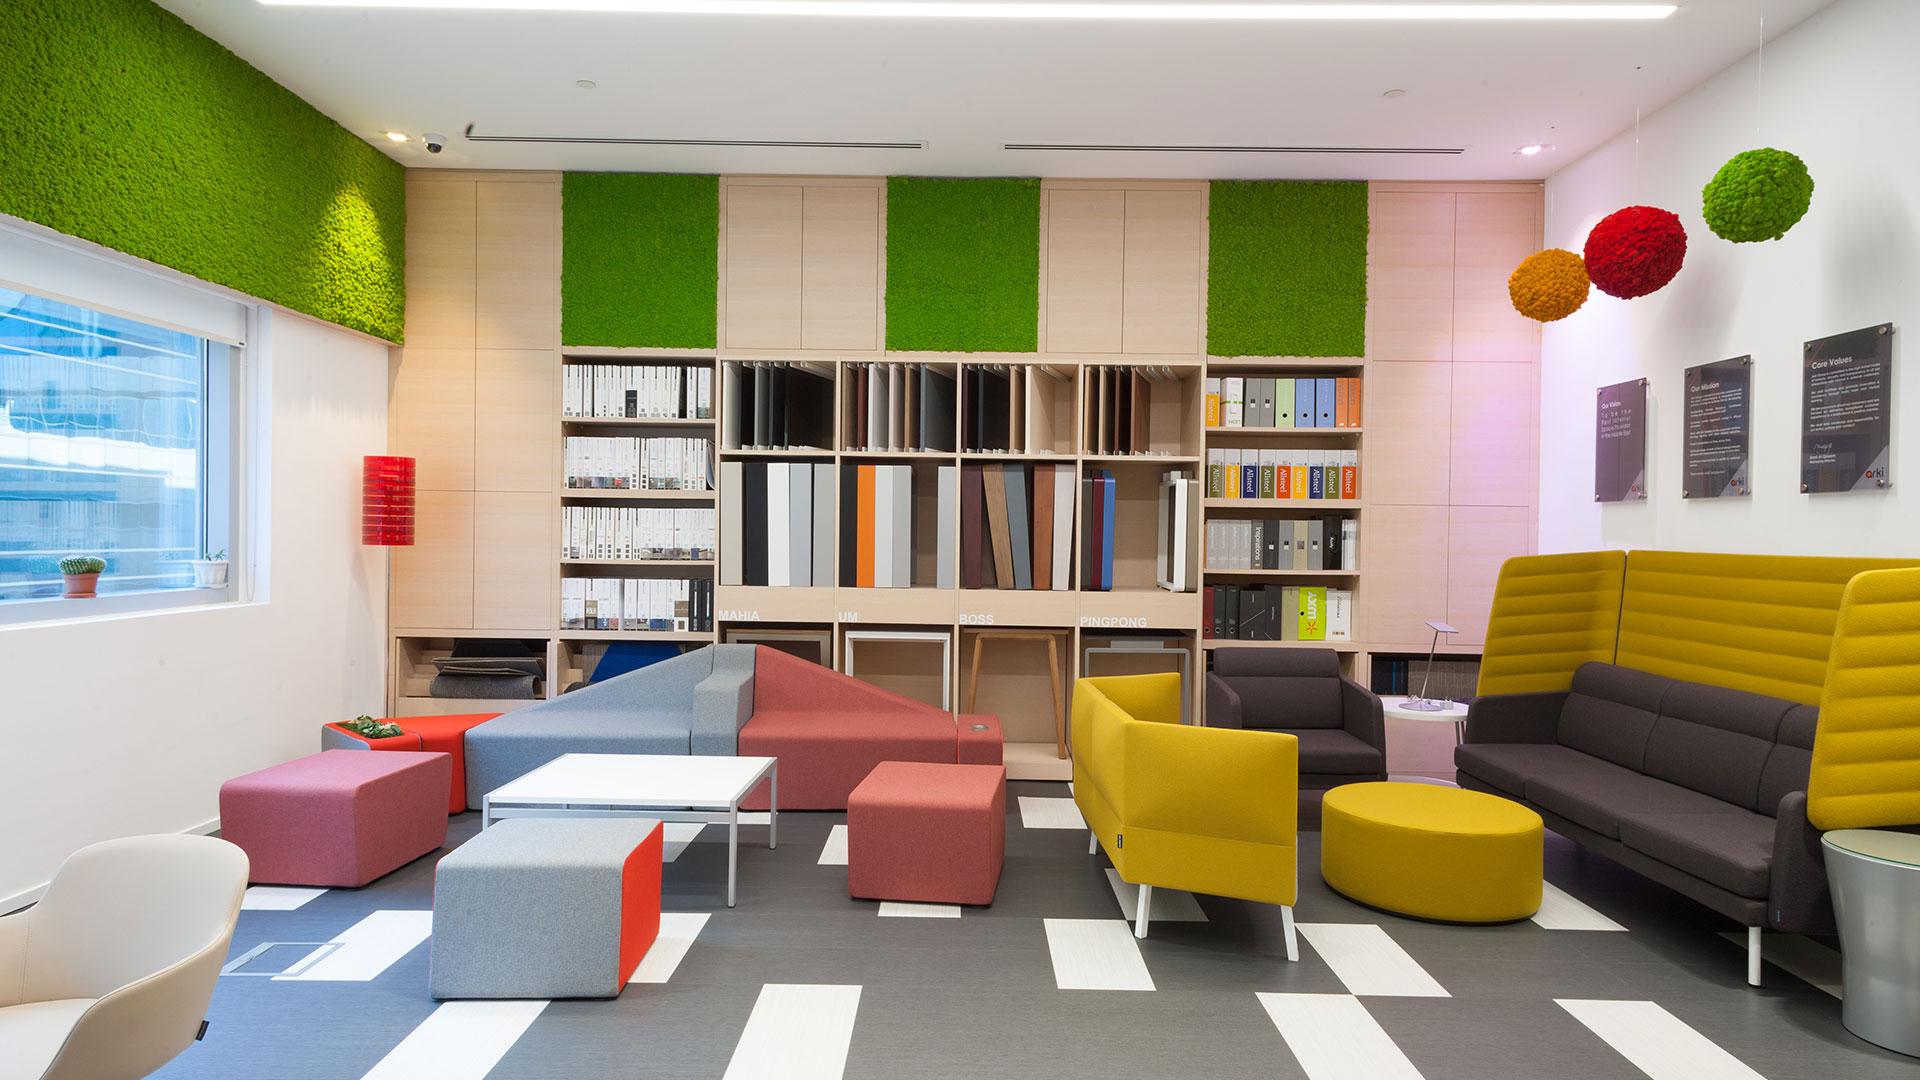 Office furniture suppliers in Dubai | Multipurpose office furniture